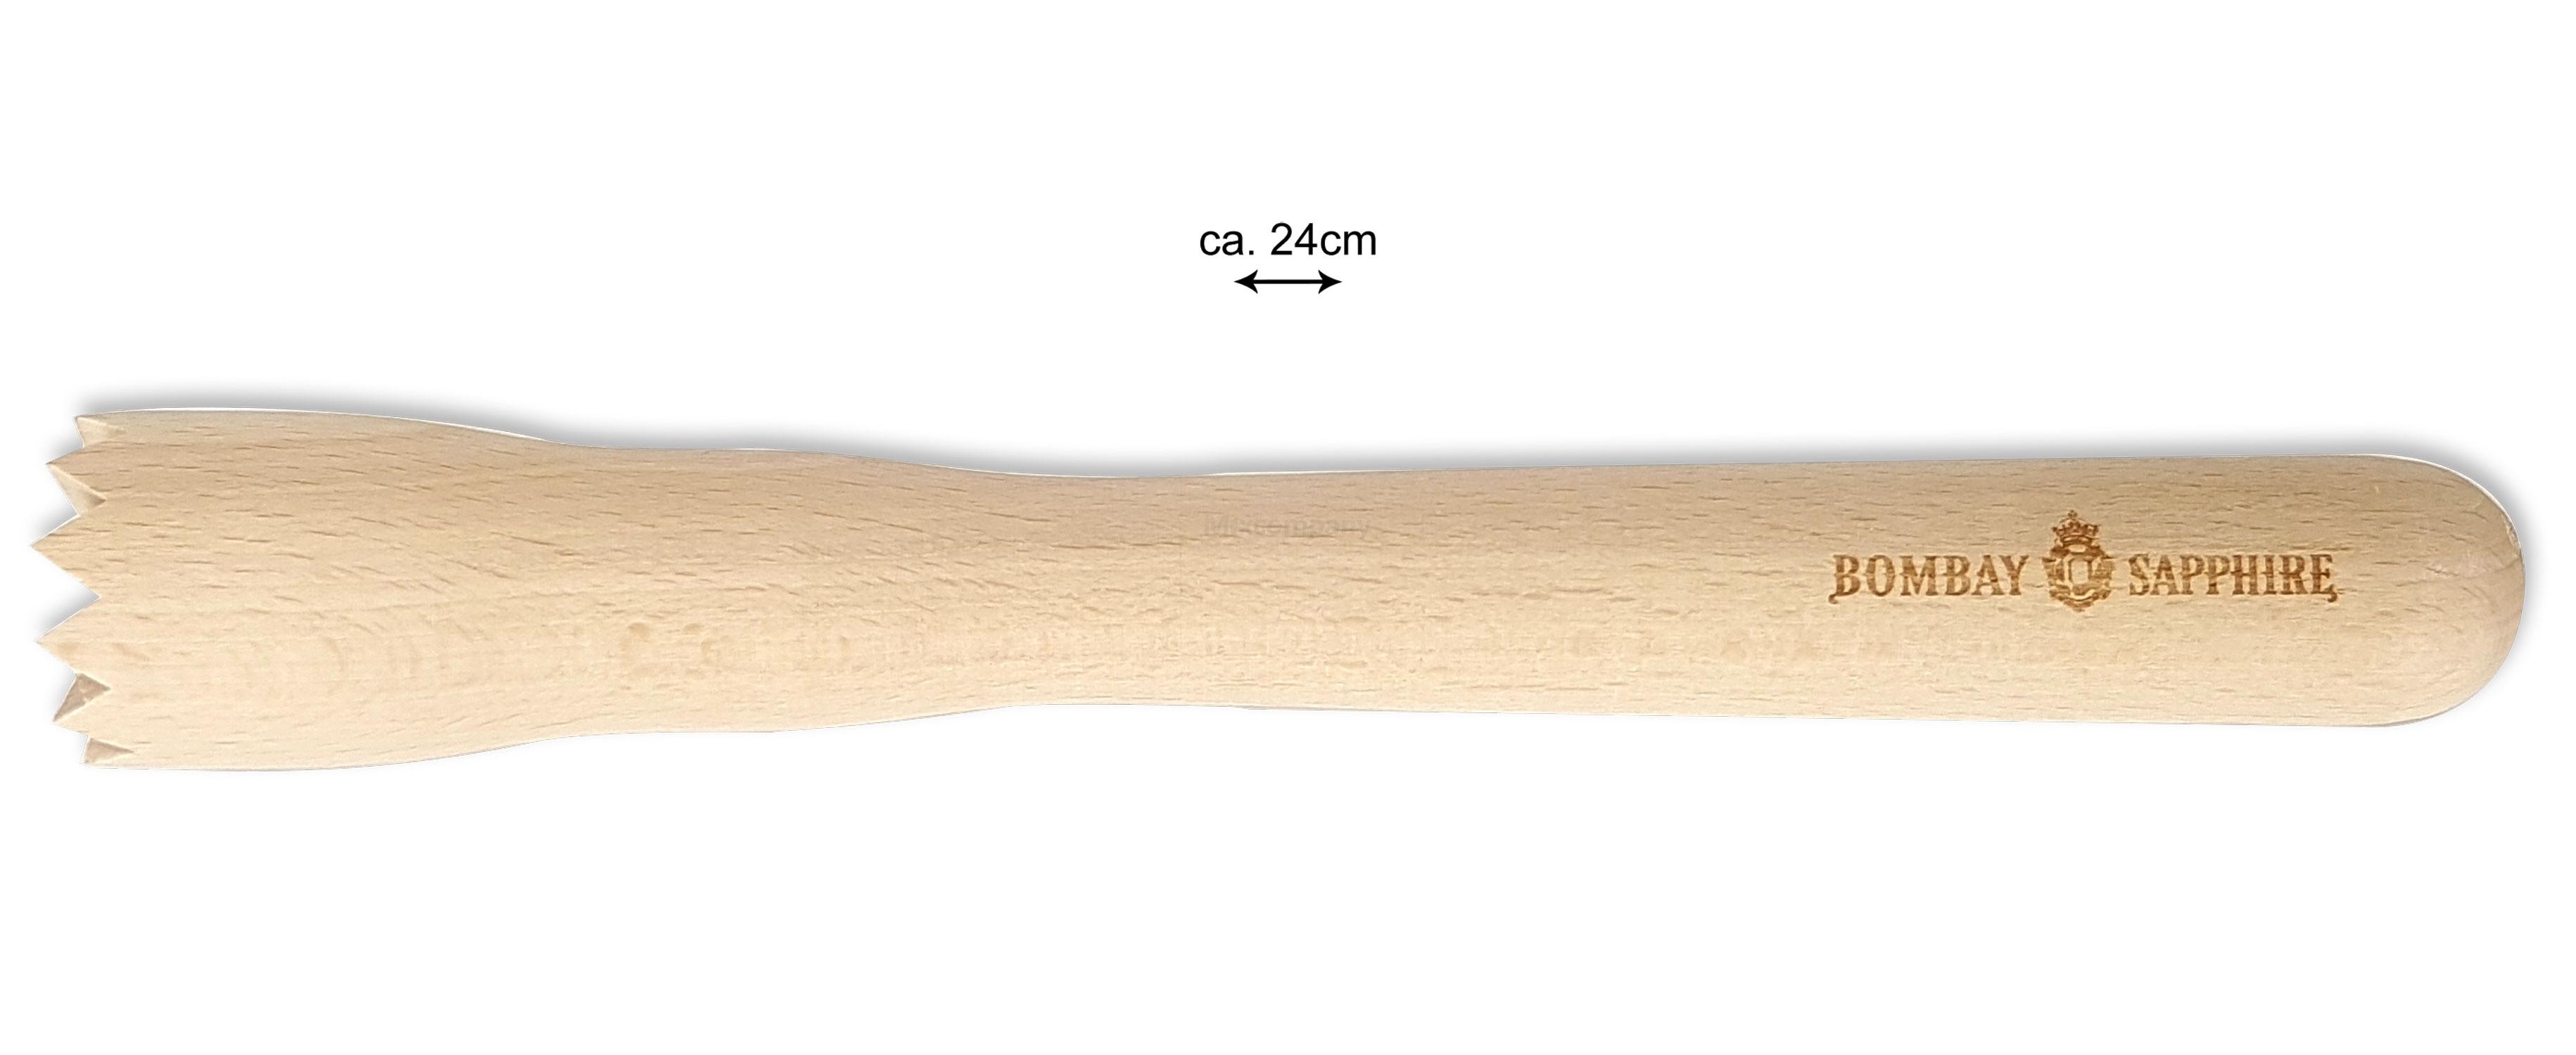 Bombay Sapphire Holzstößel Stößel für Caipirinha